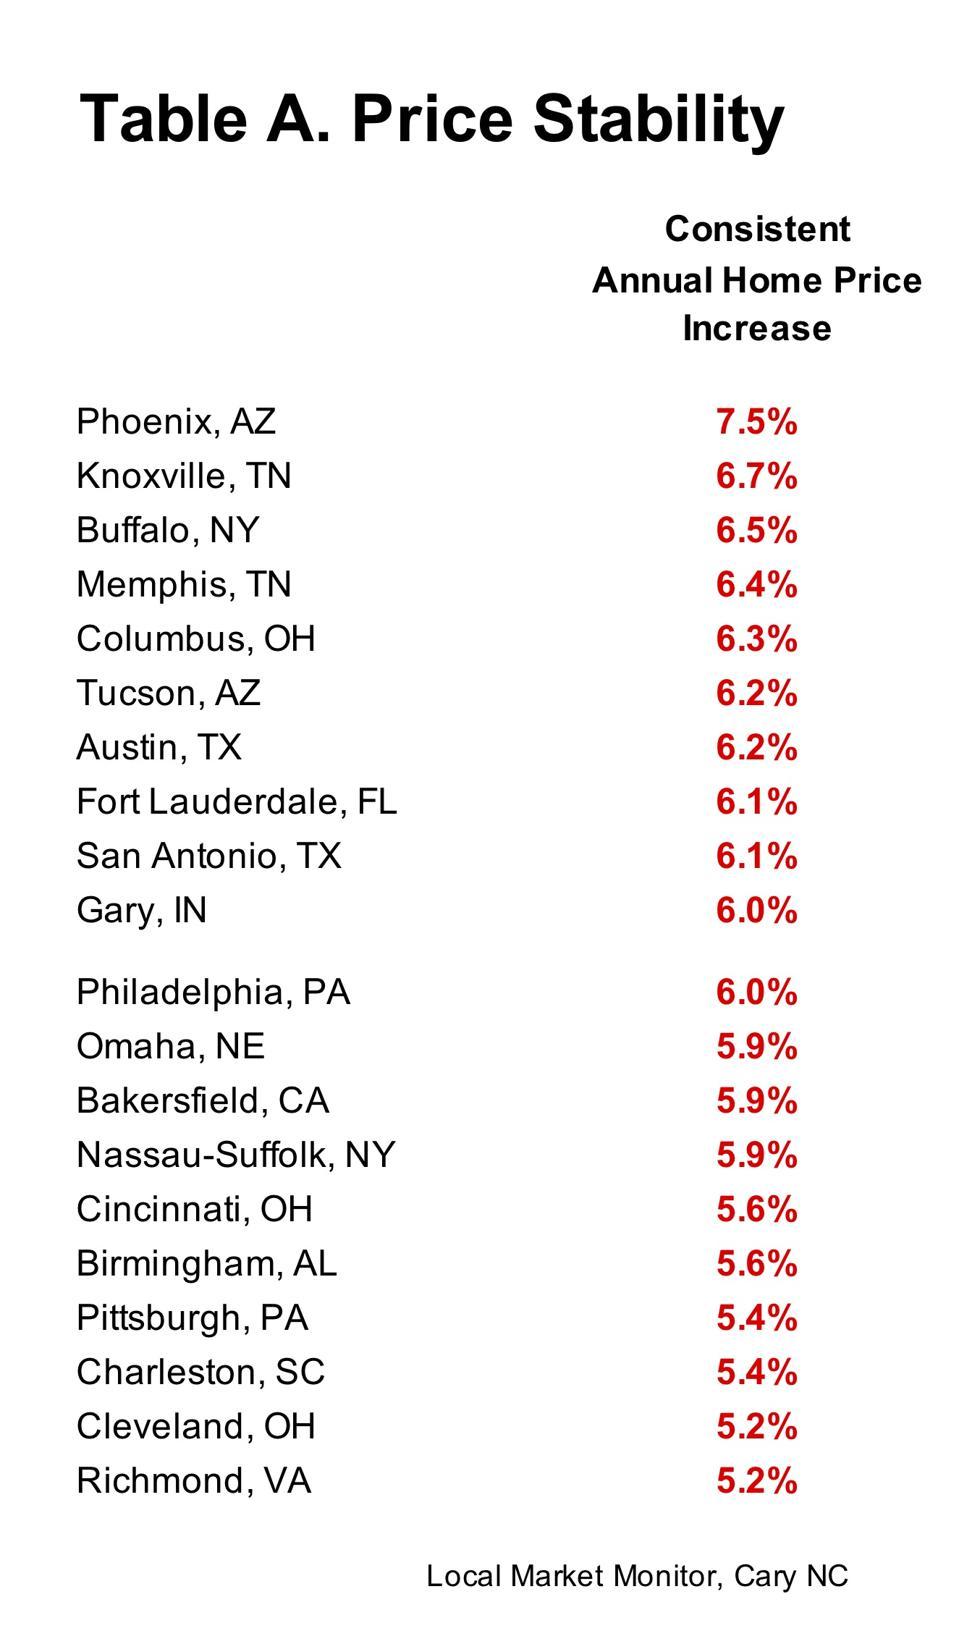 Consistent Annual Home Price Increase